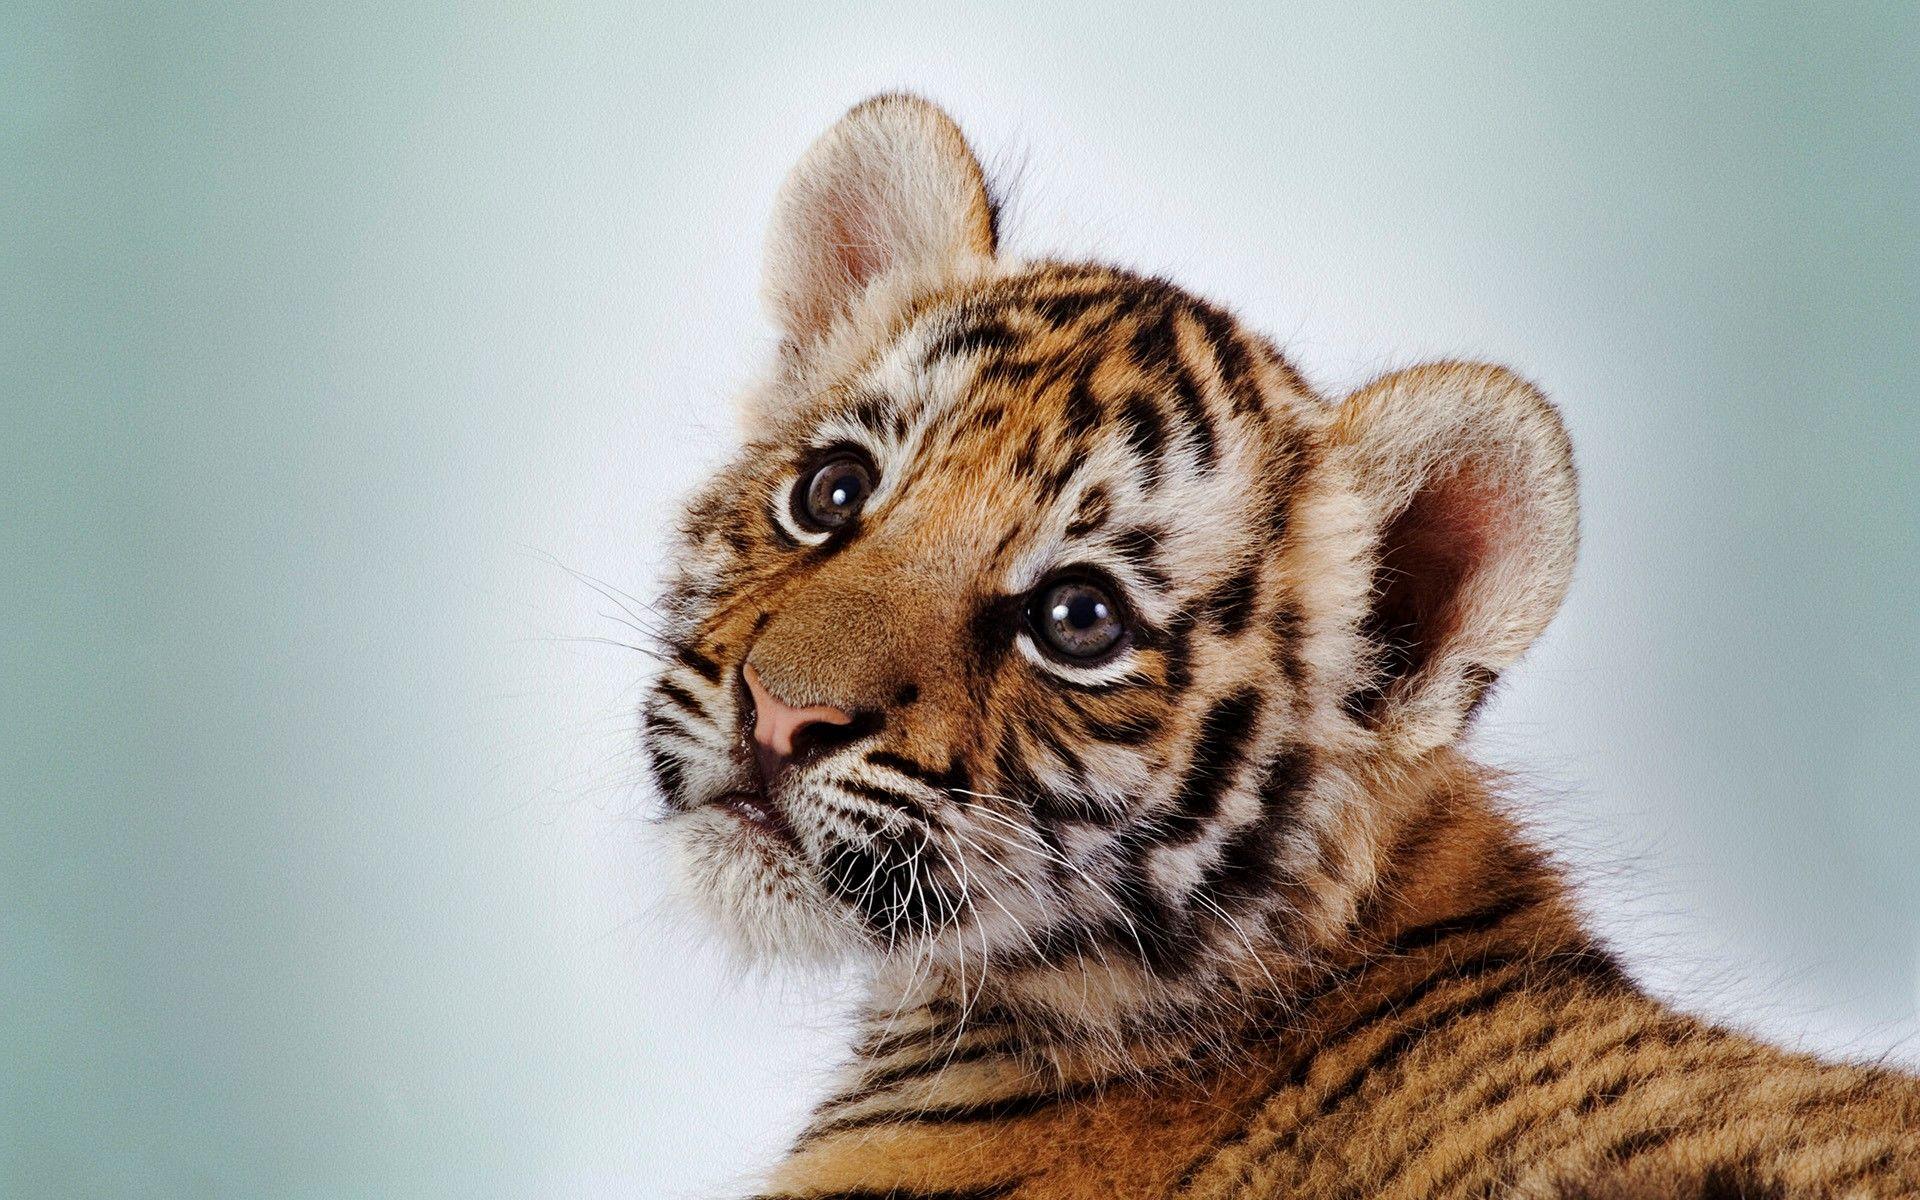 Baby Tiger Wallpaper High Quality For Desktop Wallpaper 1920 X 1200